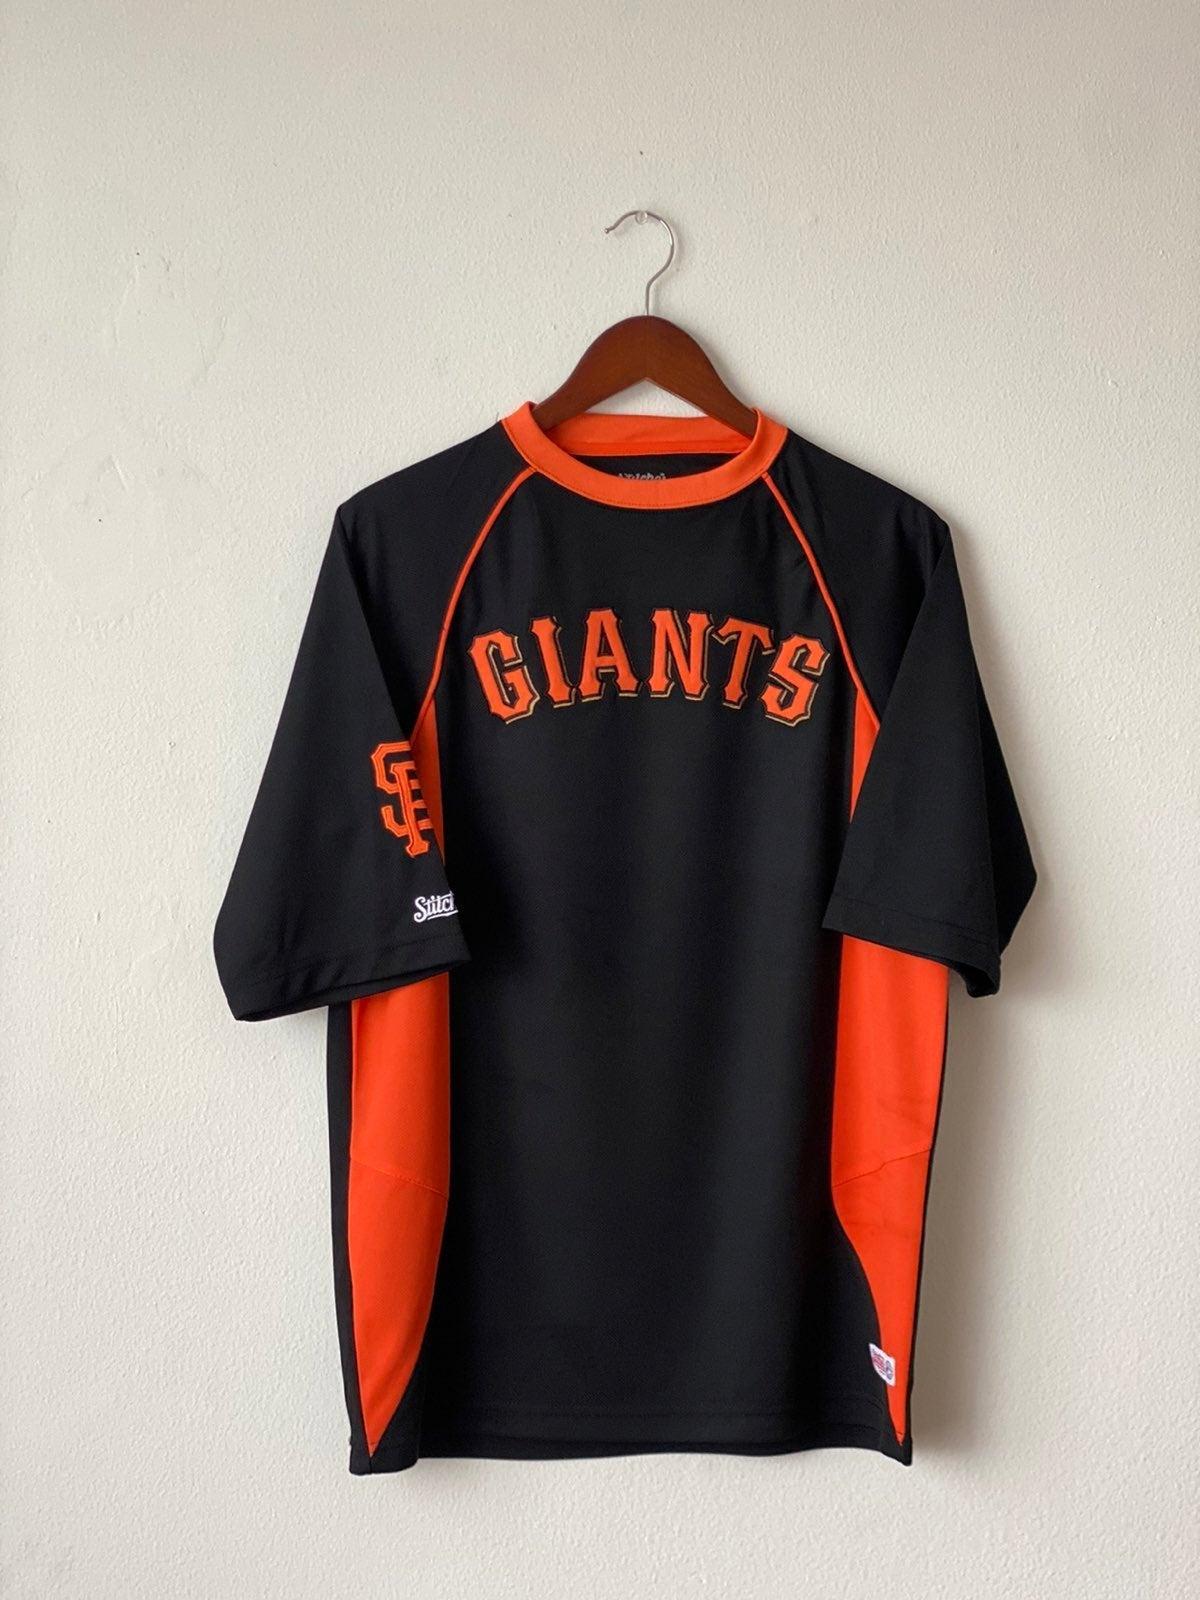 Vintage Stitches SF Giants Shirt Sz M